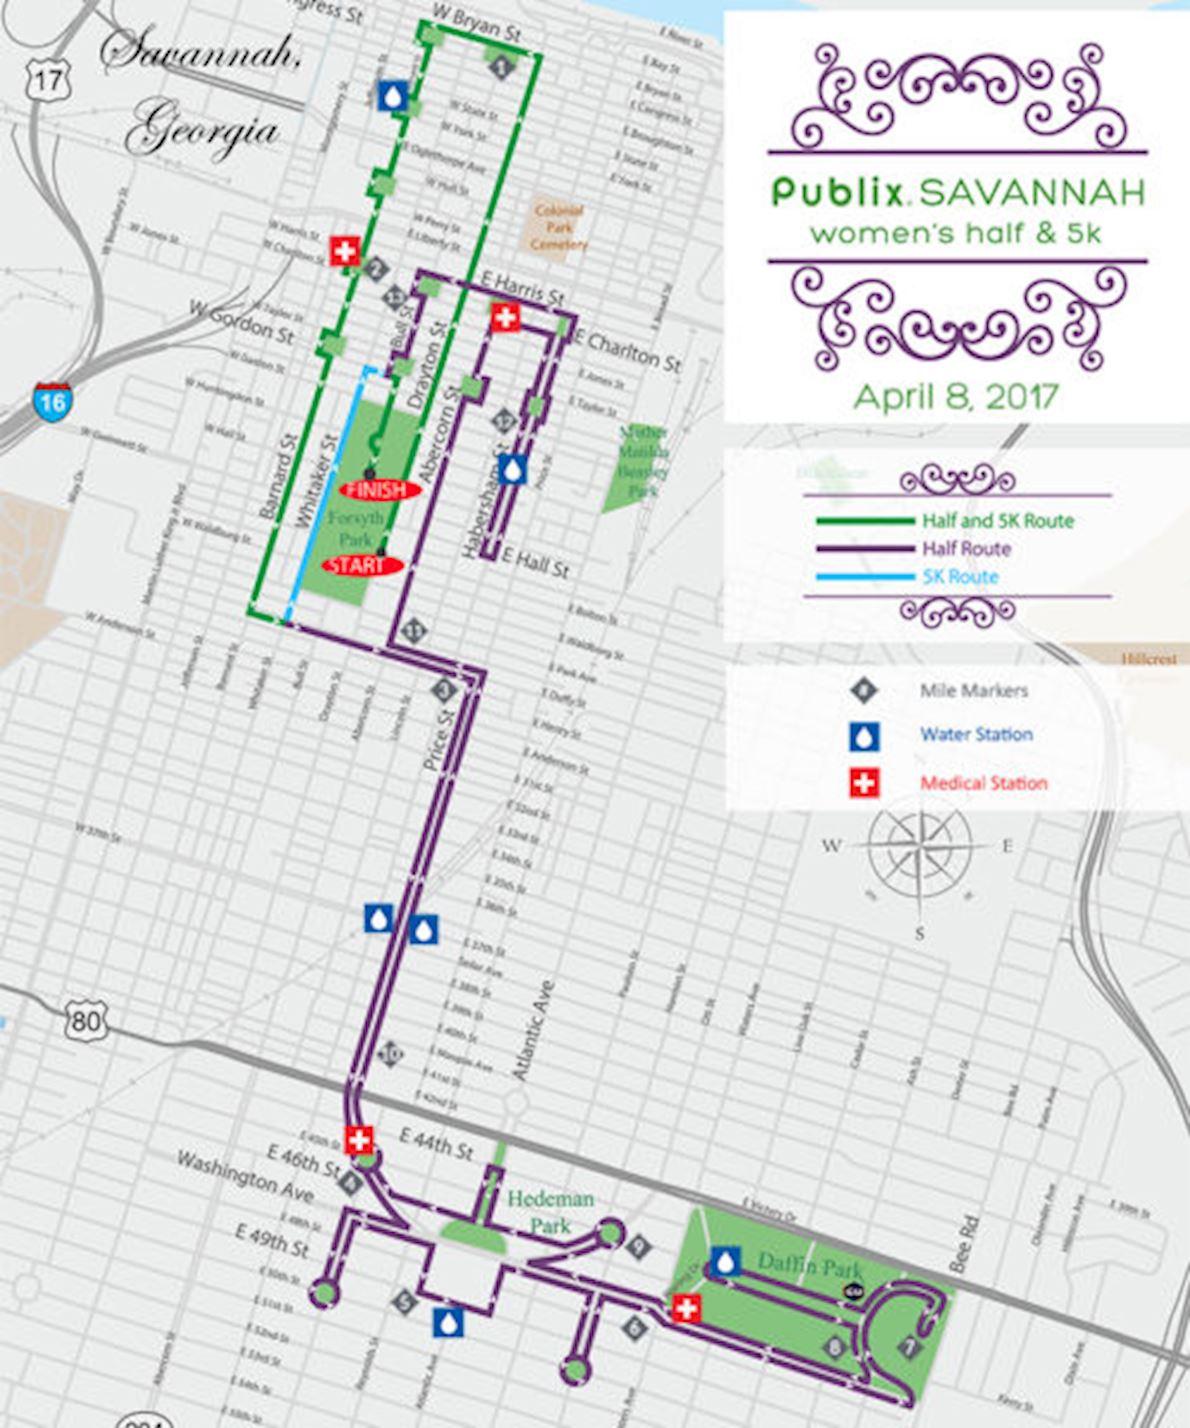 Publix Savannah Women's Half Marathon & 5K MAPA DEL RECORRIDO DE